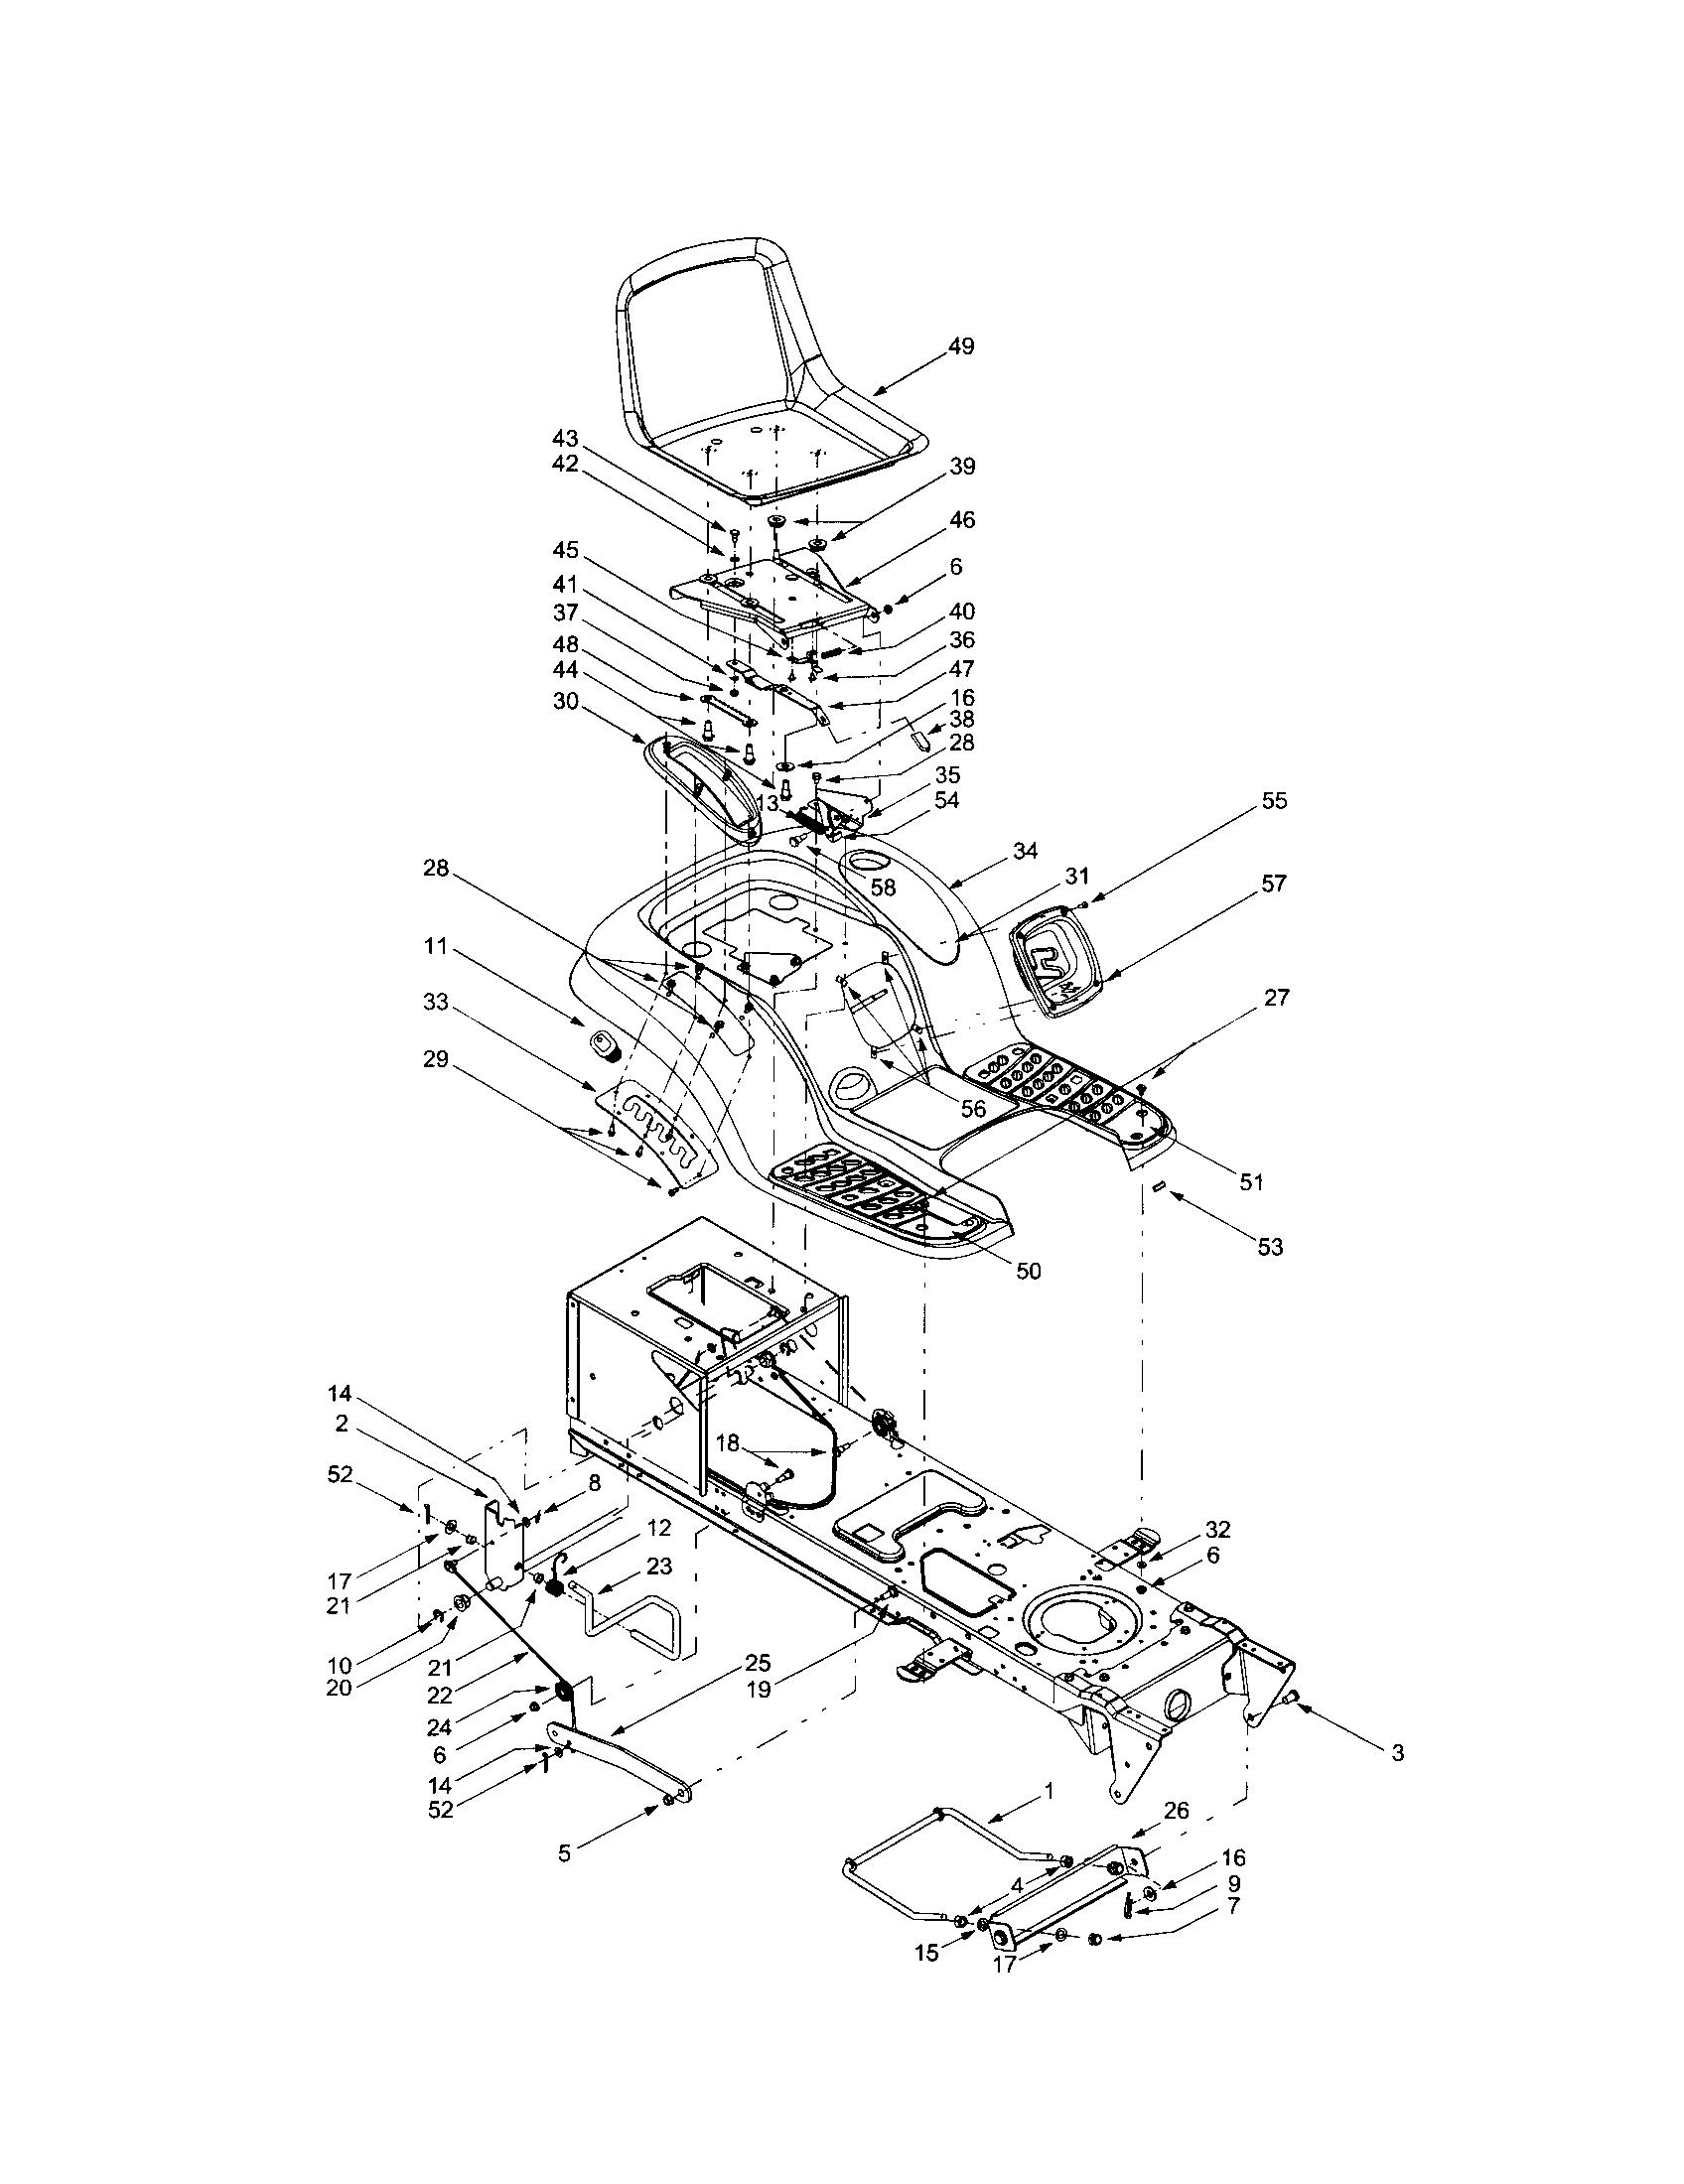 Troy Bilt Lawn Mower Model 4bv809h063 Wiring Diagram